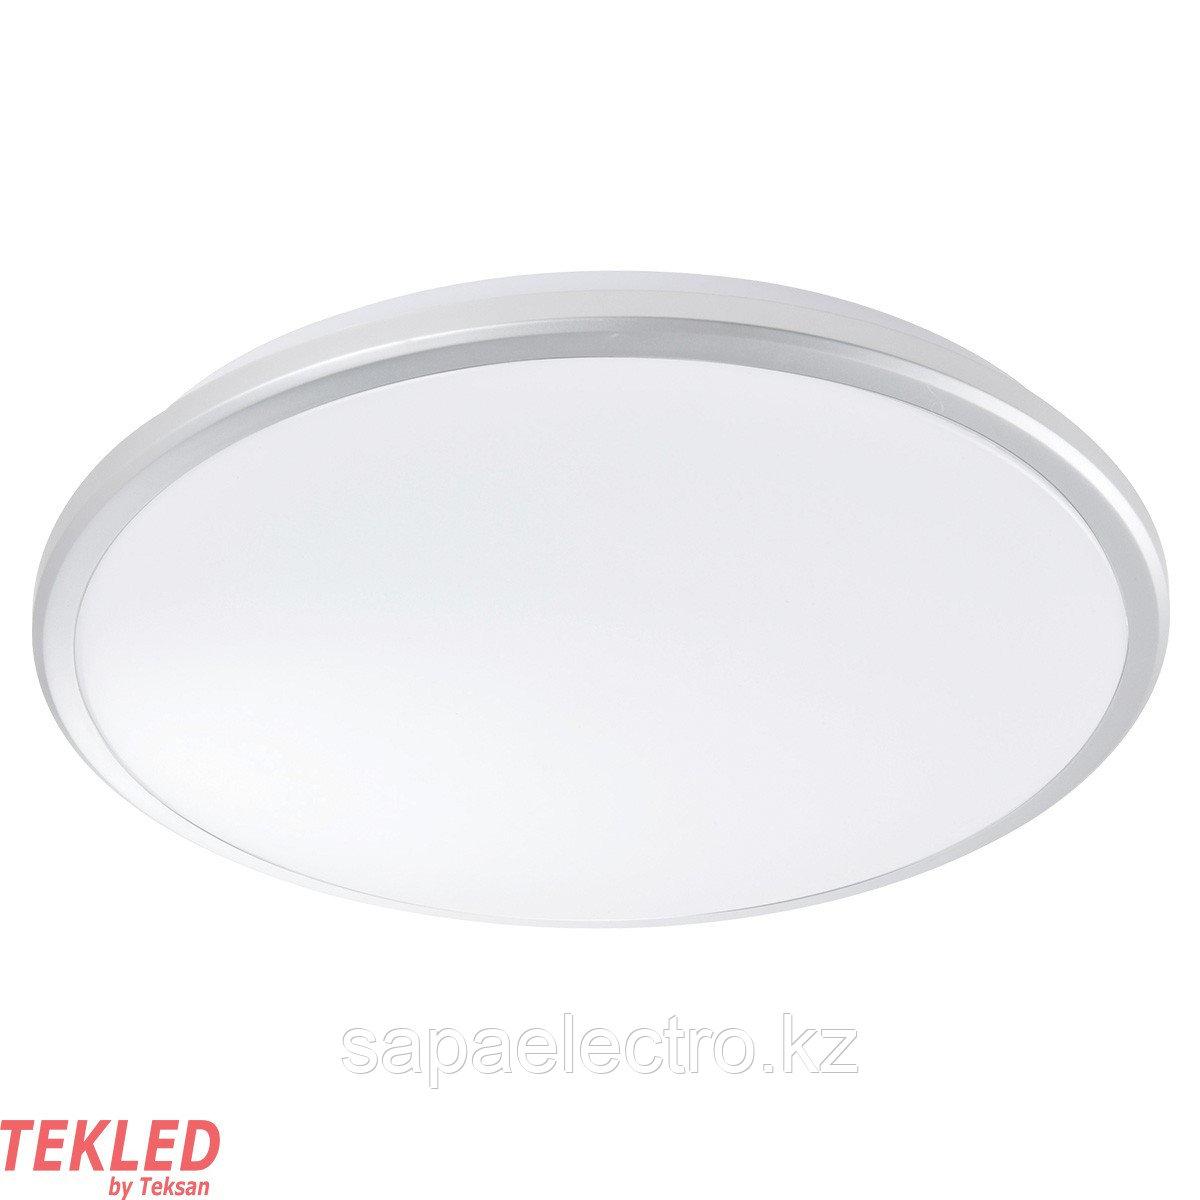 Свет-к RONDO LED 22W 6000K   (TEKSAN) 8шт